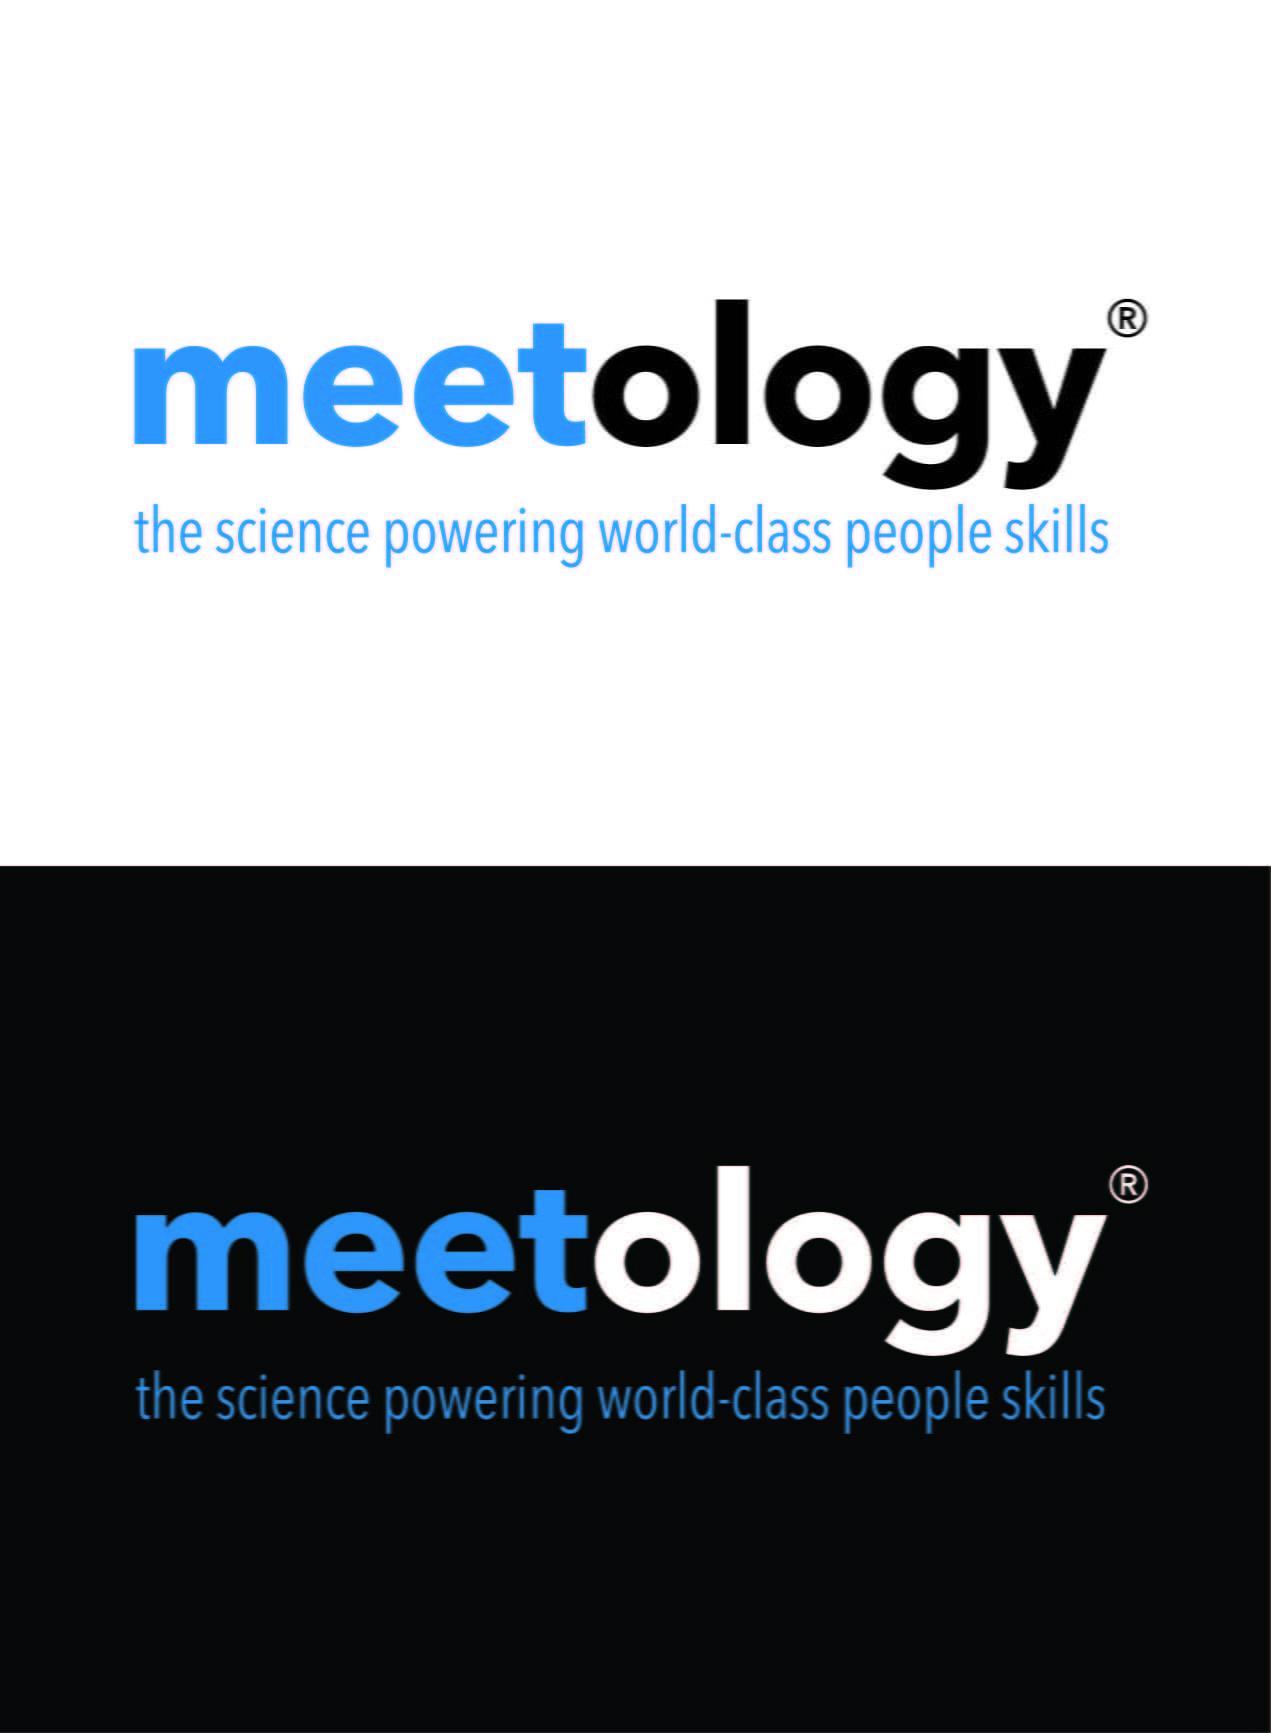 meetology-logo